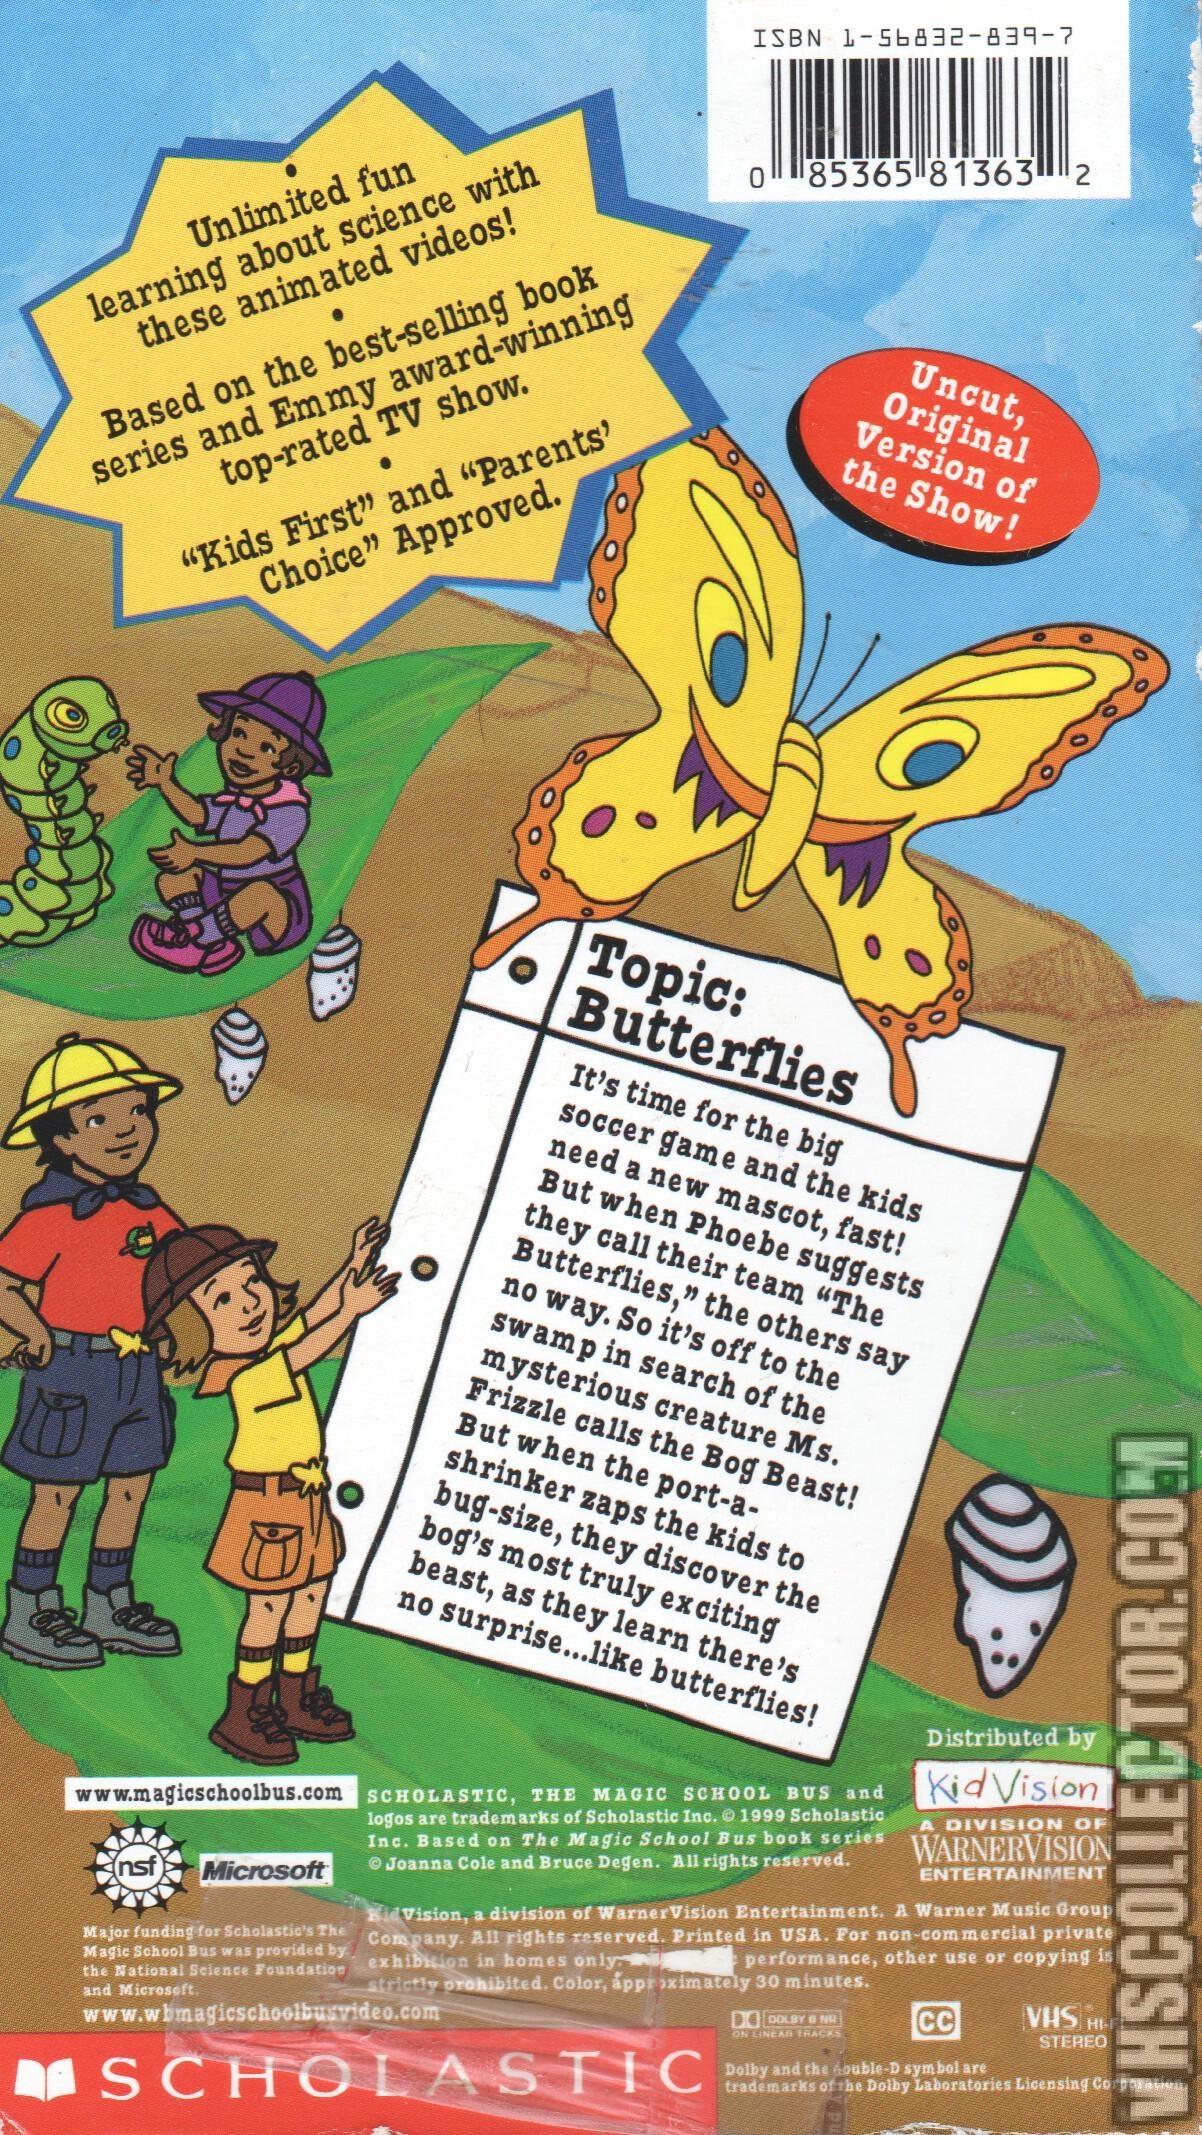 The Magic School Bus Butterflies